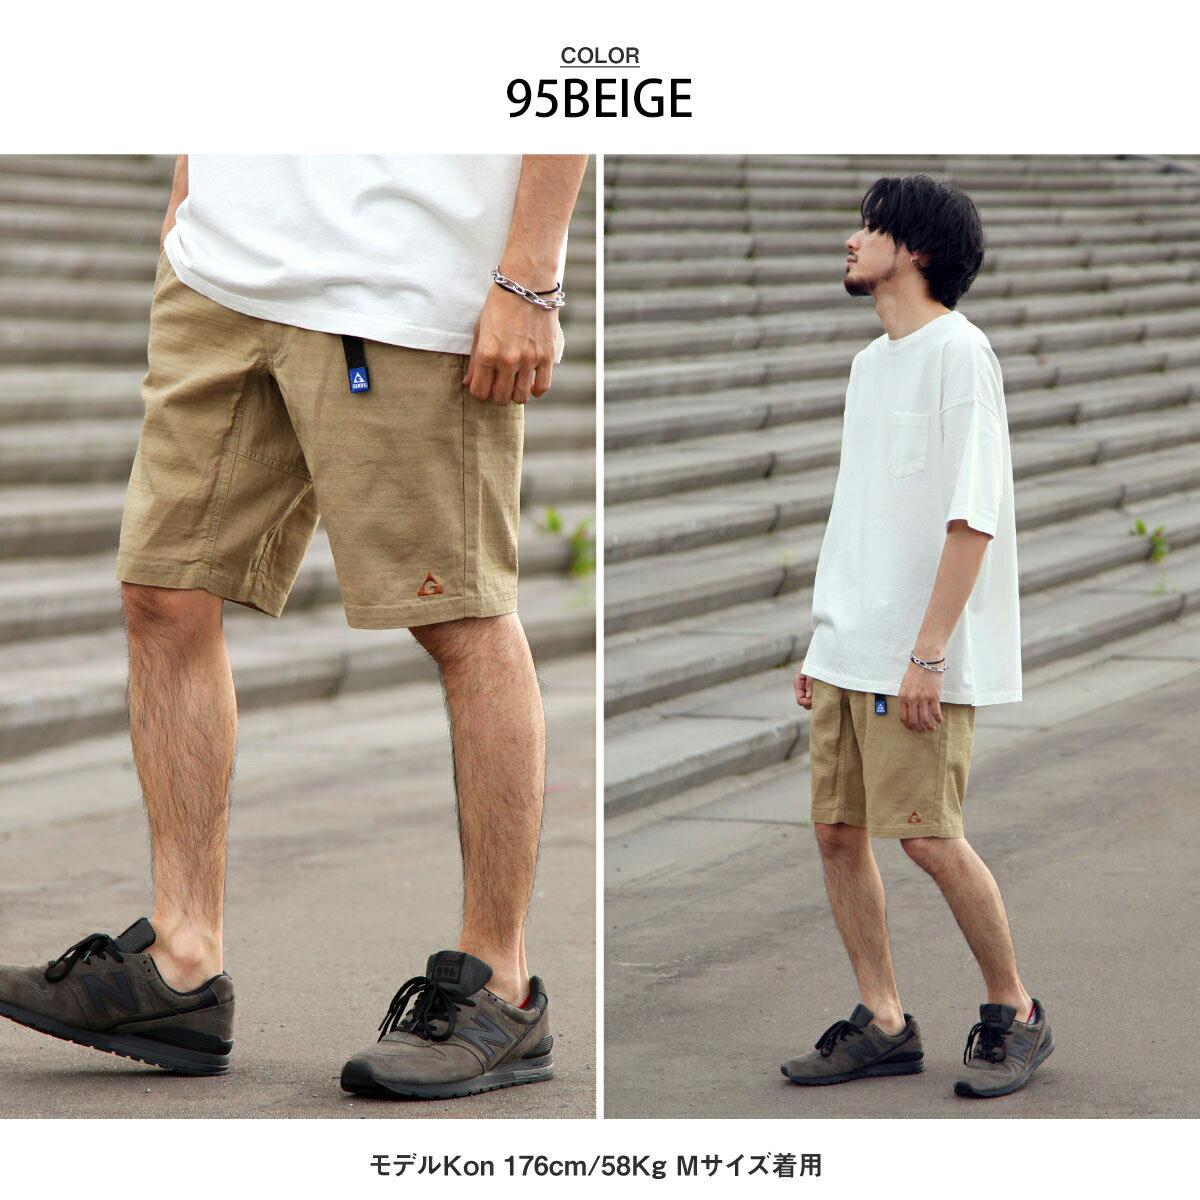 【GERRY】透氣登山短褲 Baniran 5